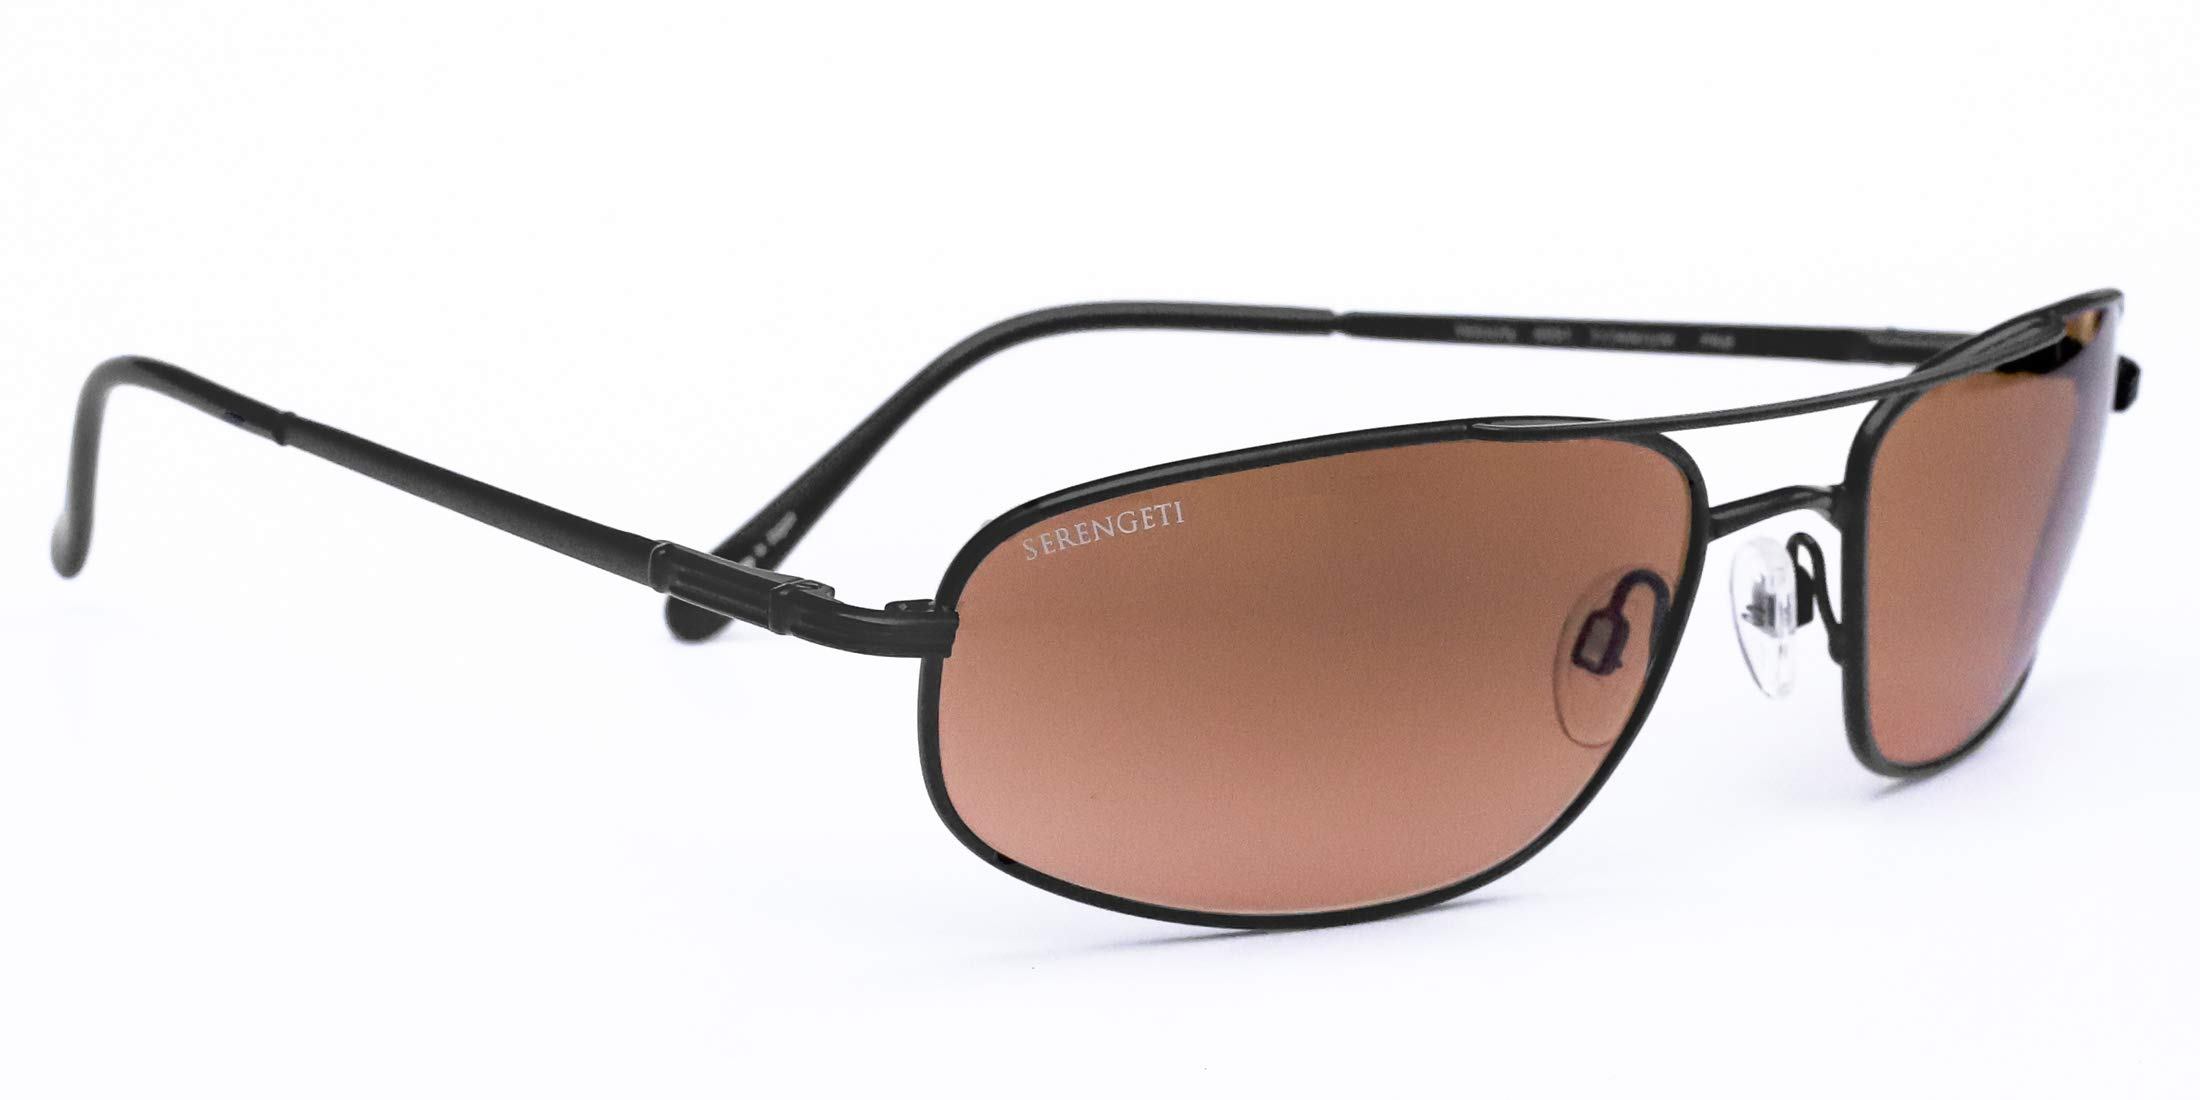 Serengeti Velocity Sunglasses (Satin Black) with Silicon Gel Nose Pads by Serengeti